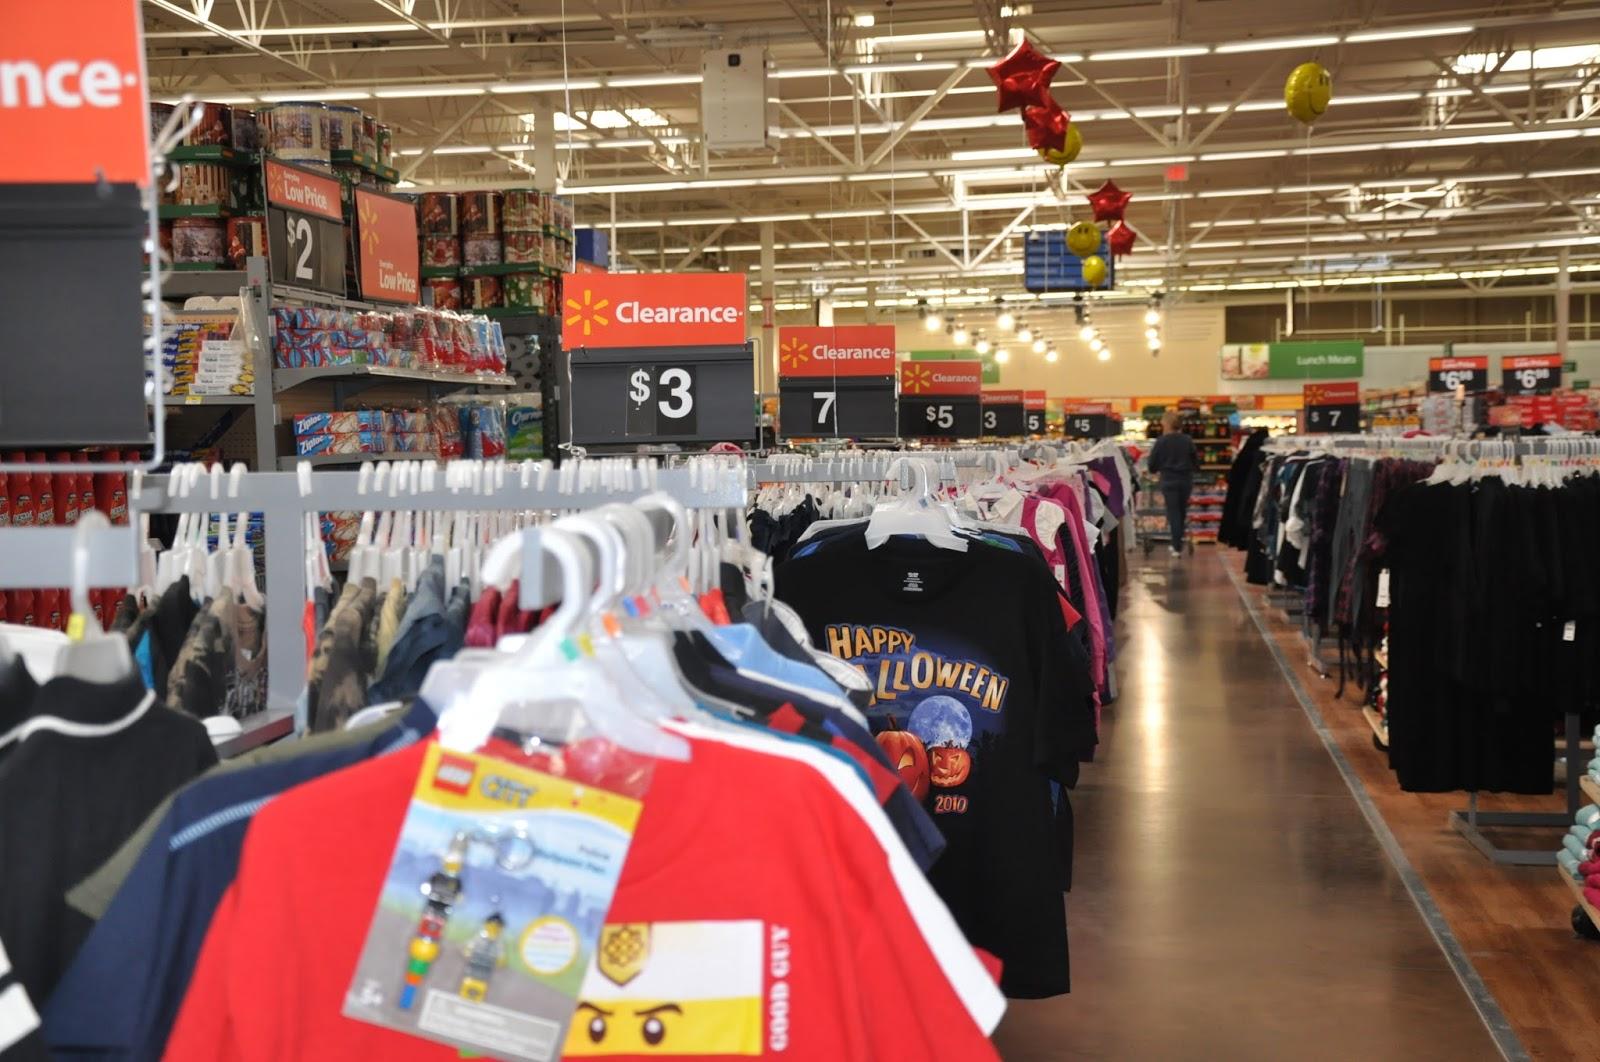 Clearance clothes shop online